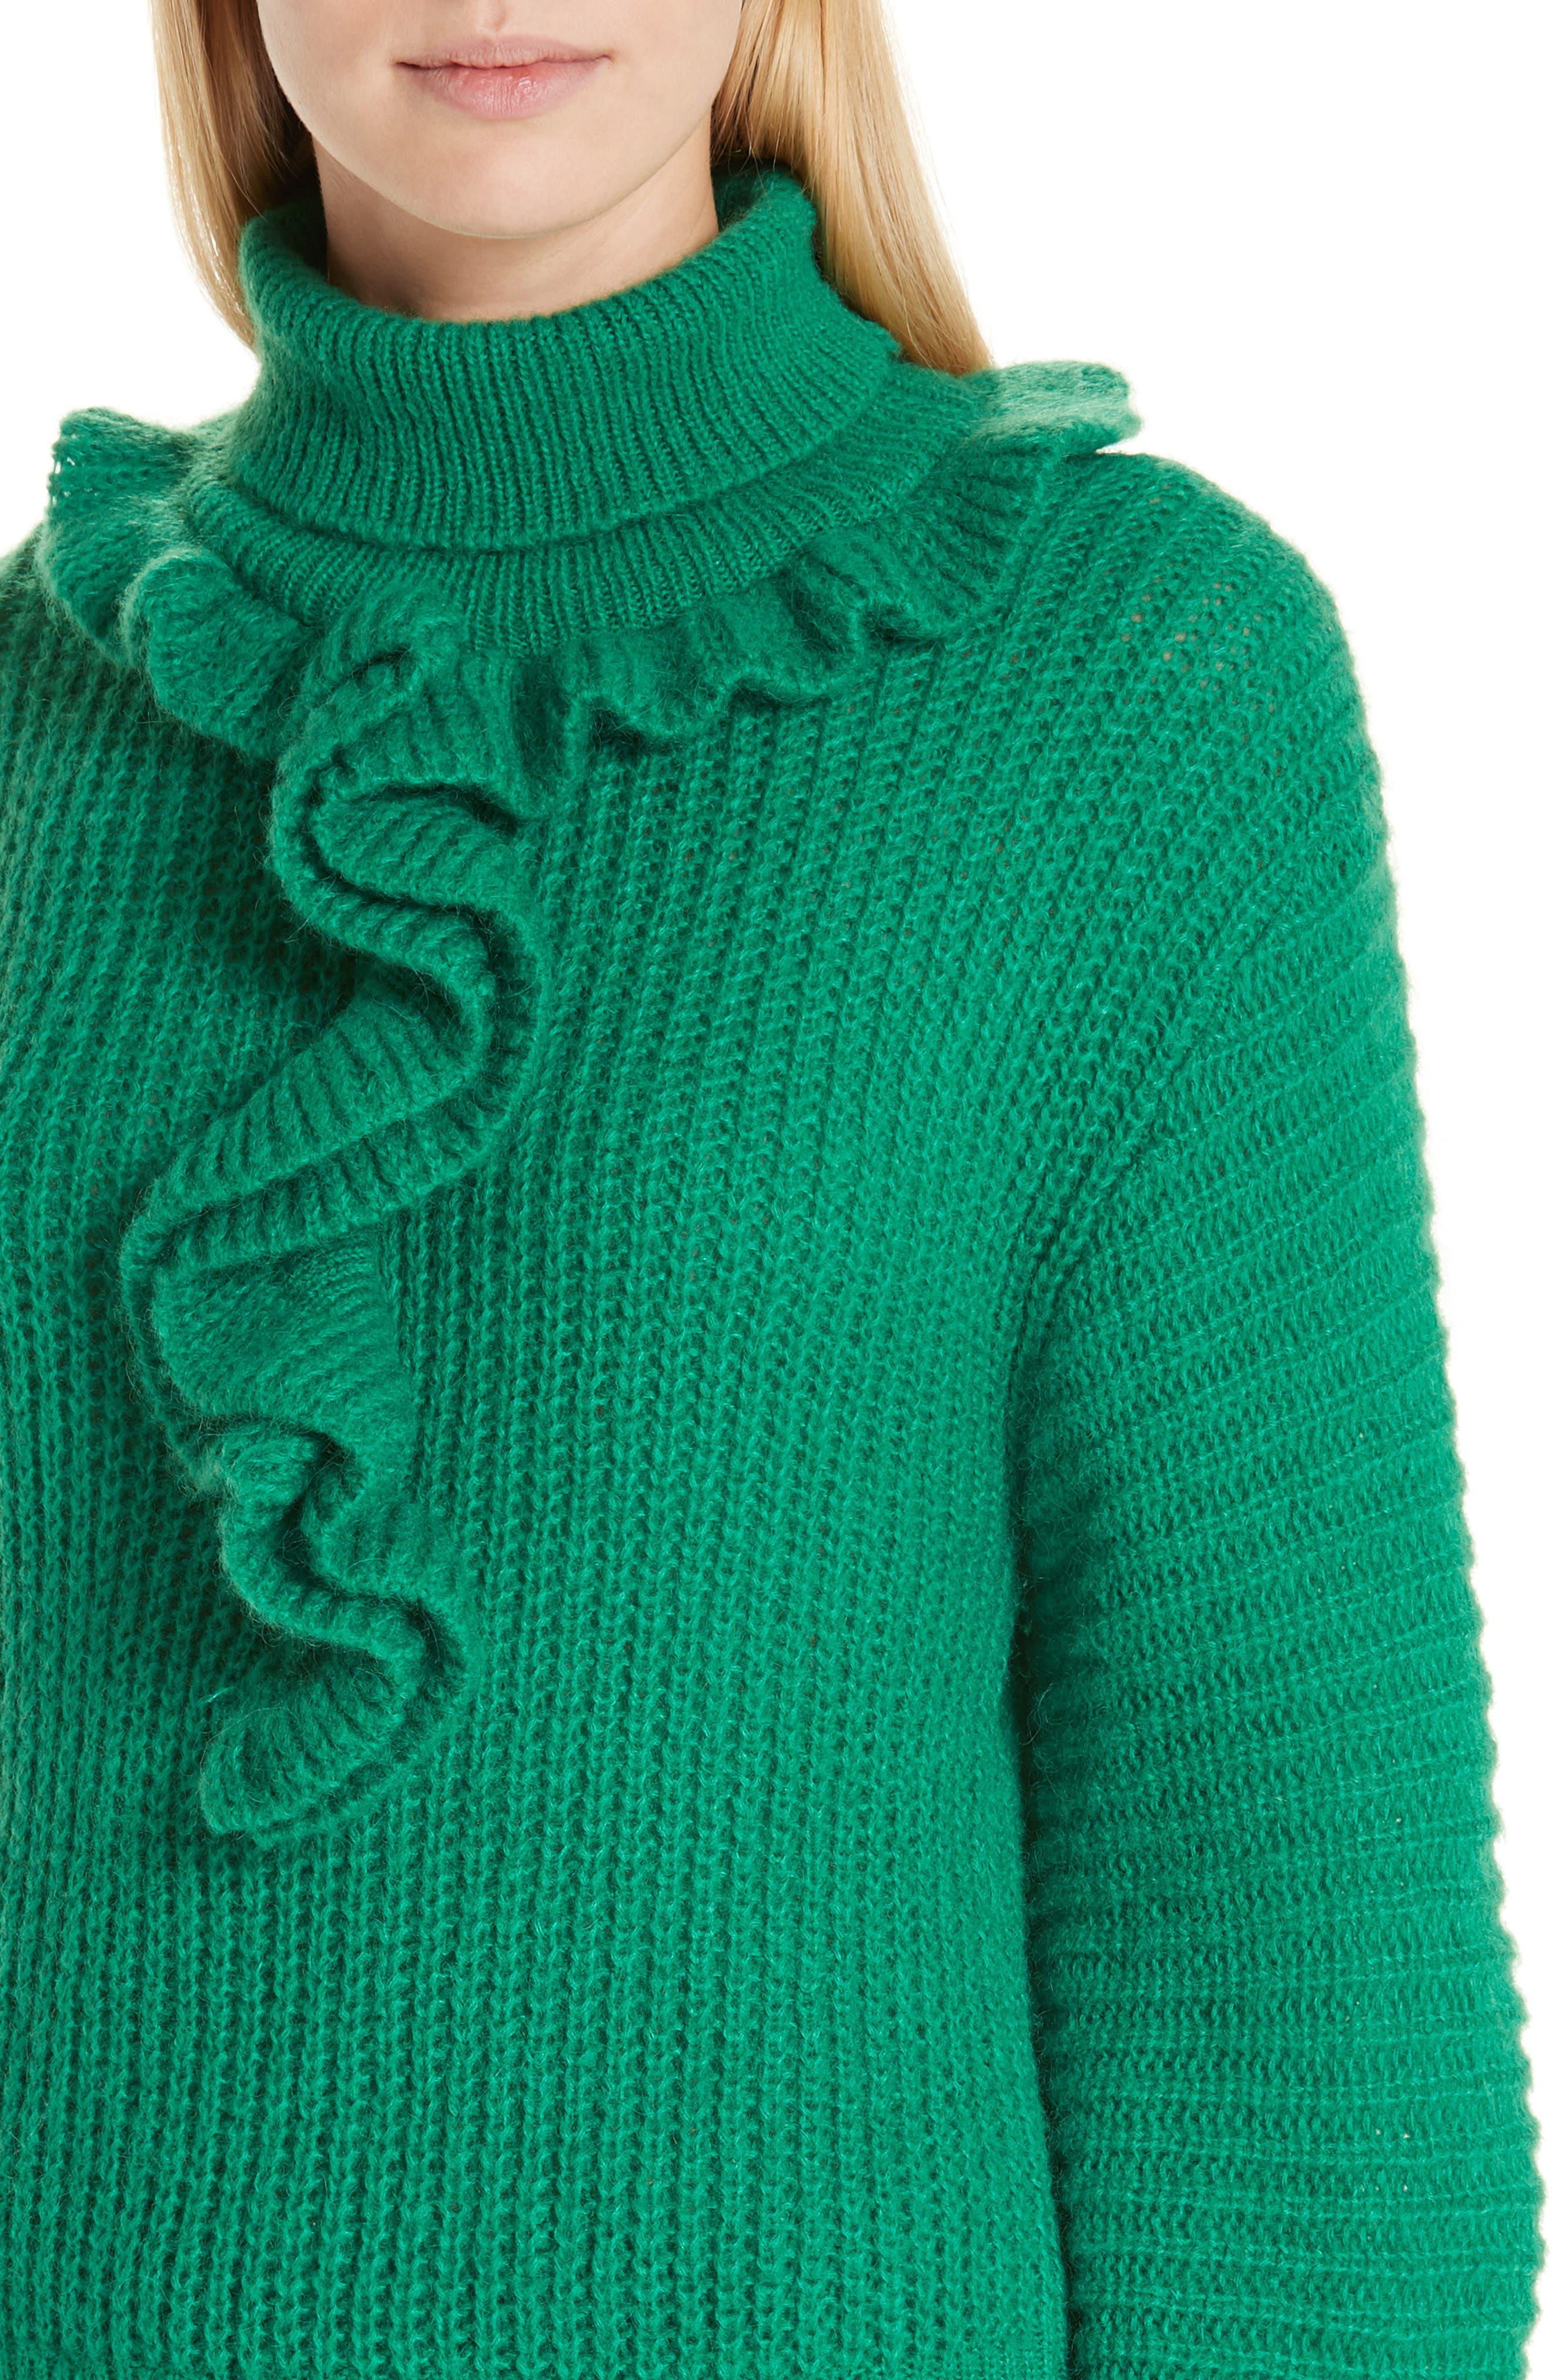 Ruffle Neck Sweater,                             Alternate thumbnail 4, color,                             GRASS GREEN